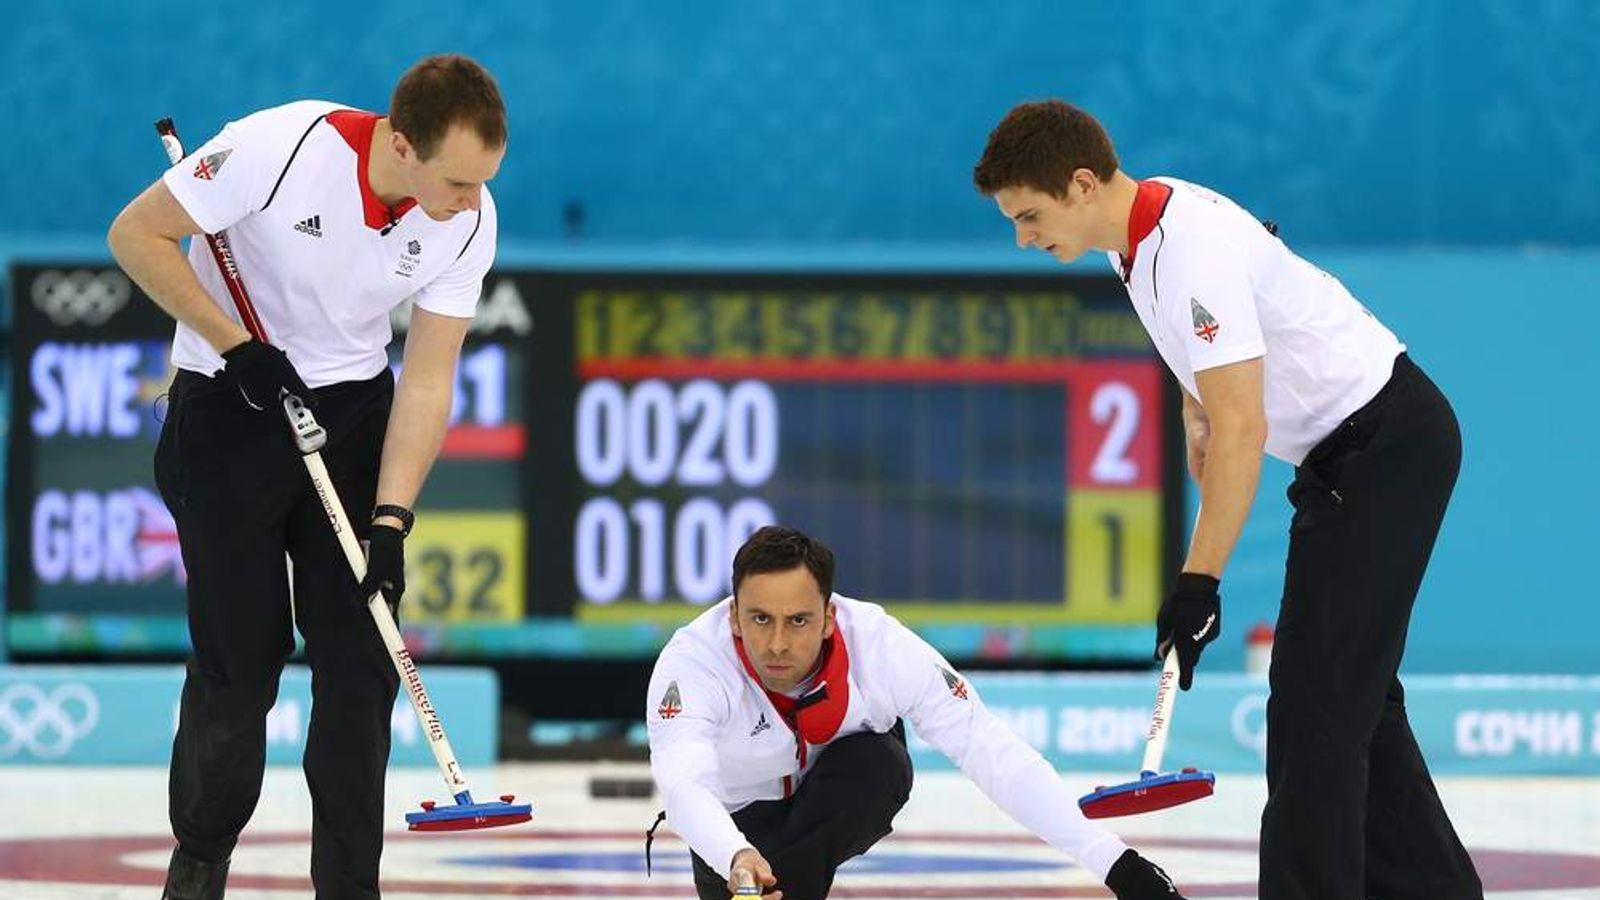 David Murdoch (C) at the Winter Olympics in Sochi, 2014